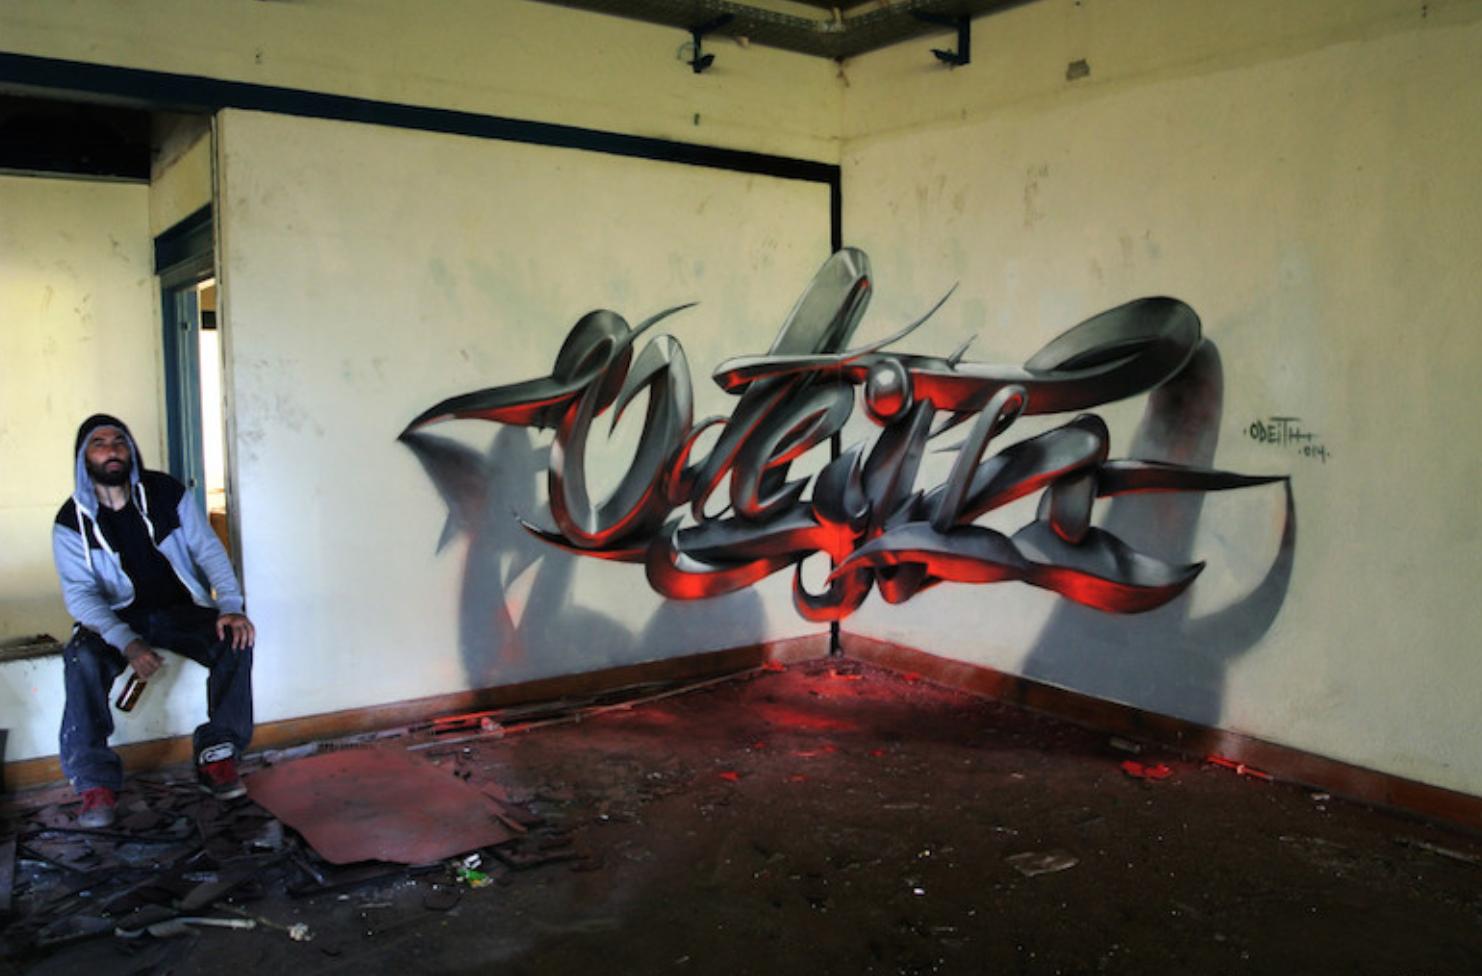 3d Graffiti 3 Freedom Of Creation